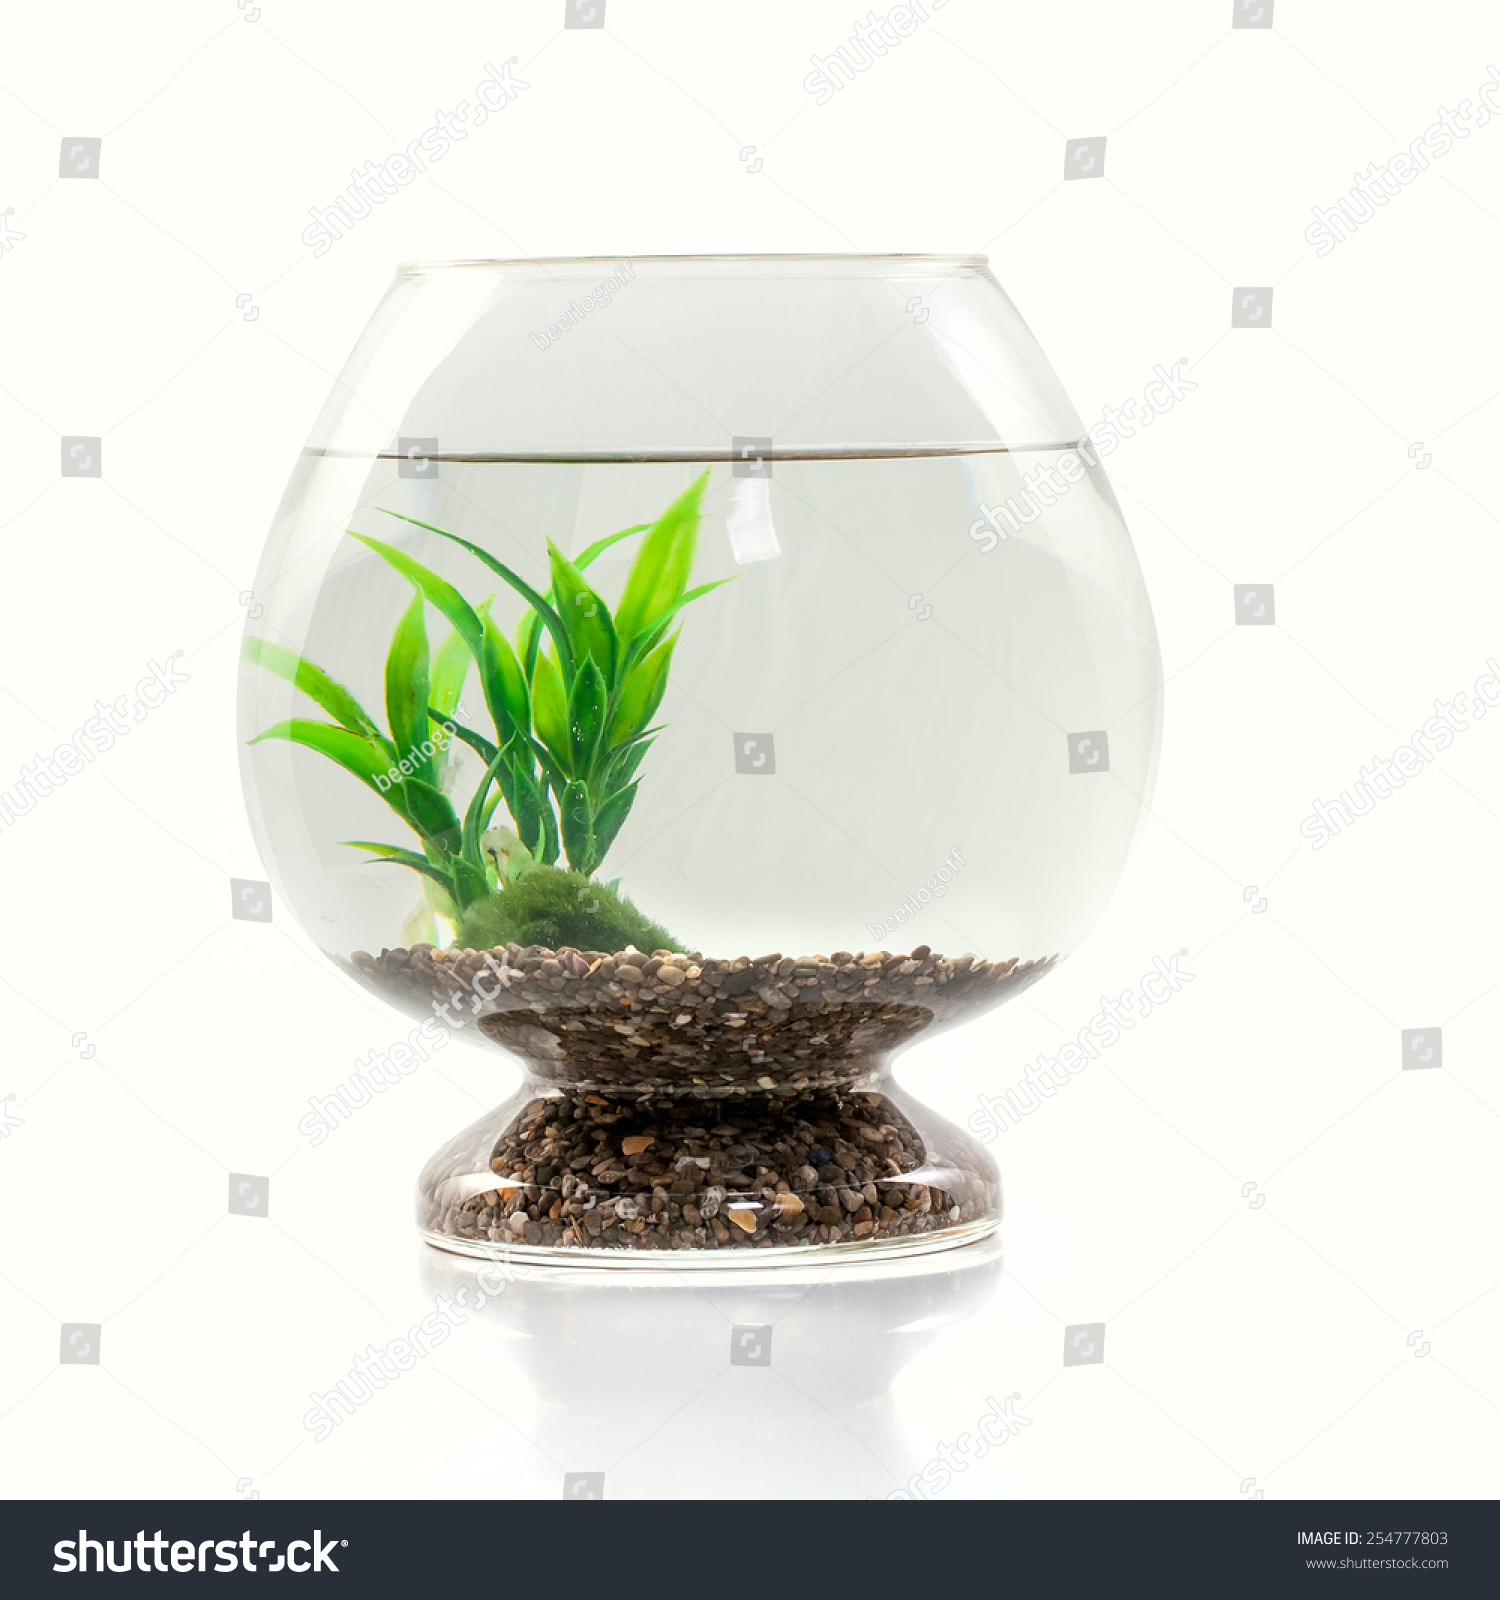 Aquarium algae and stones isolated on white stock photo for White algae in fish tank